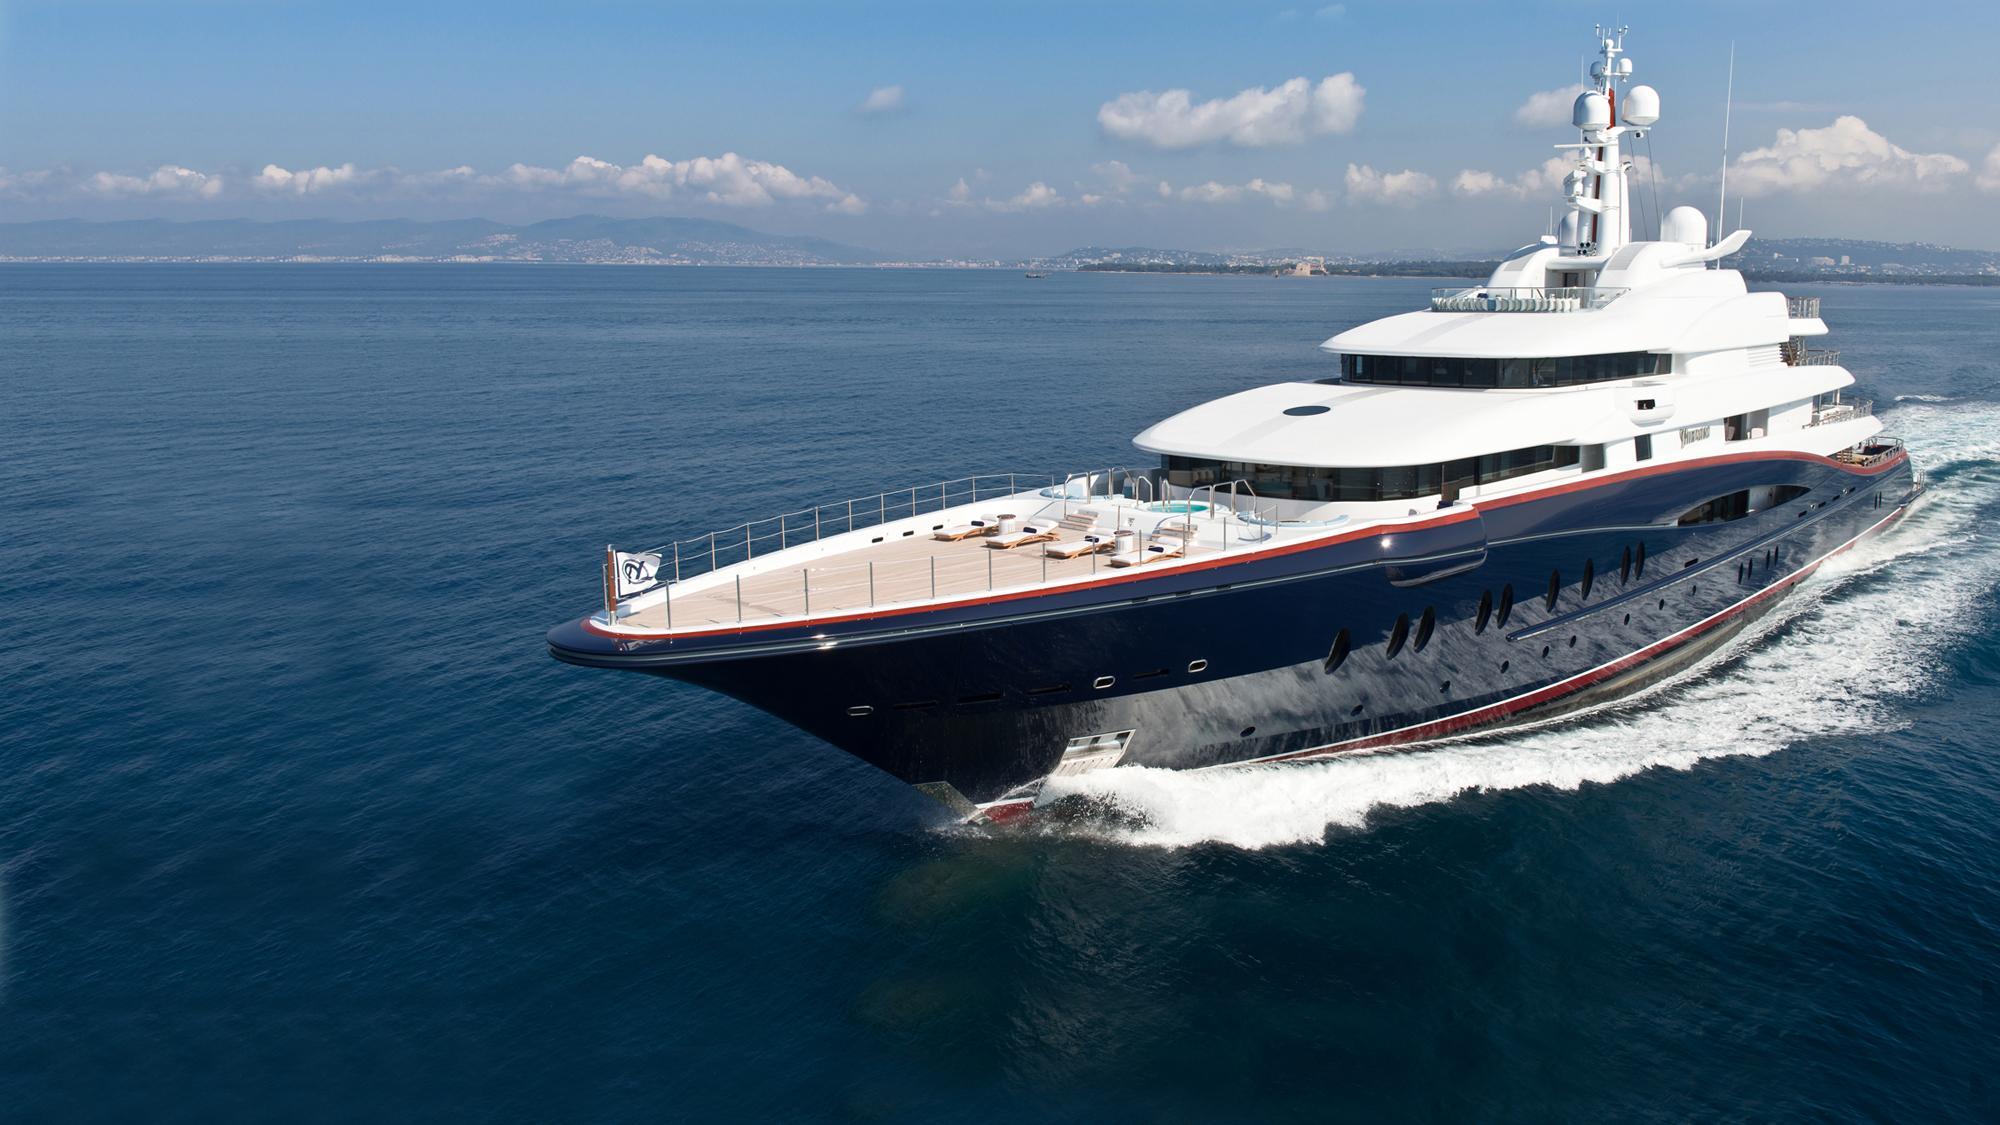 nirvana-motor-yacht-oceanco-2012-88m-half-profile-cruising